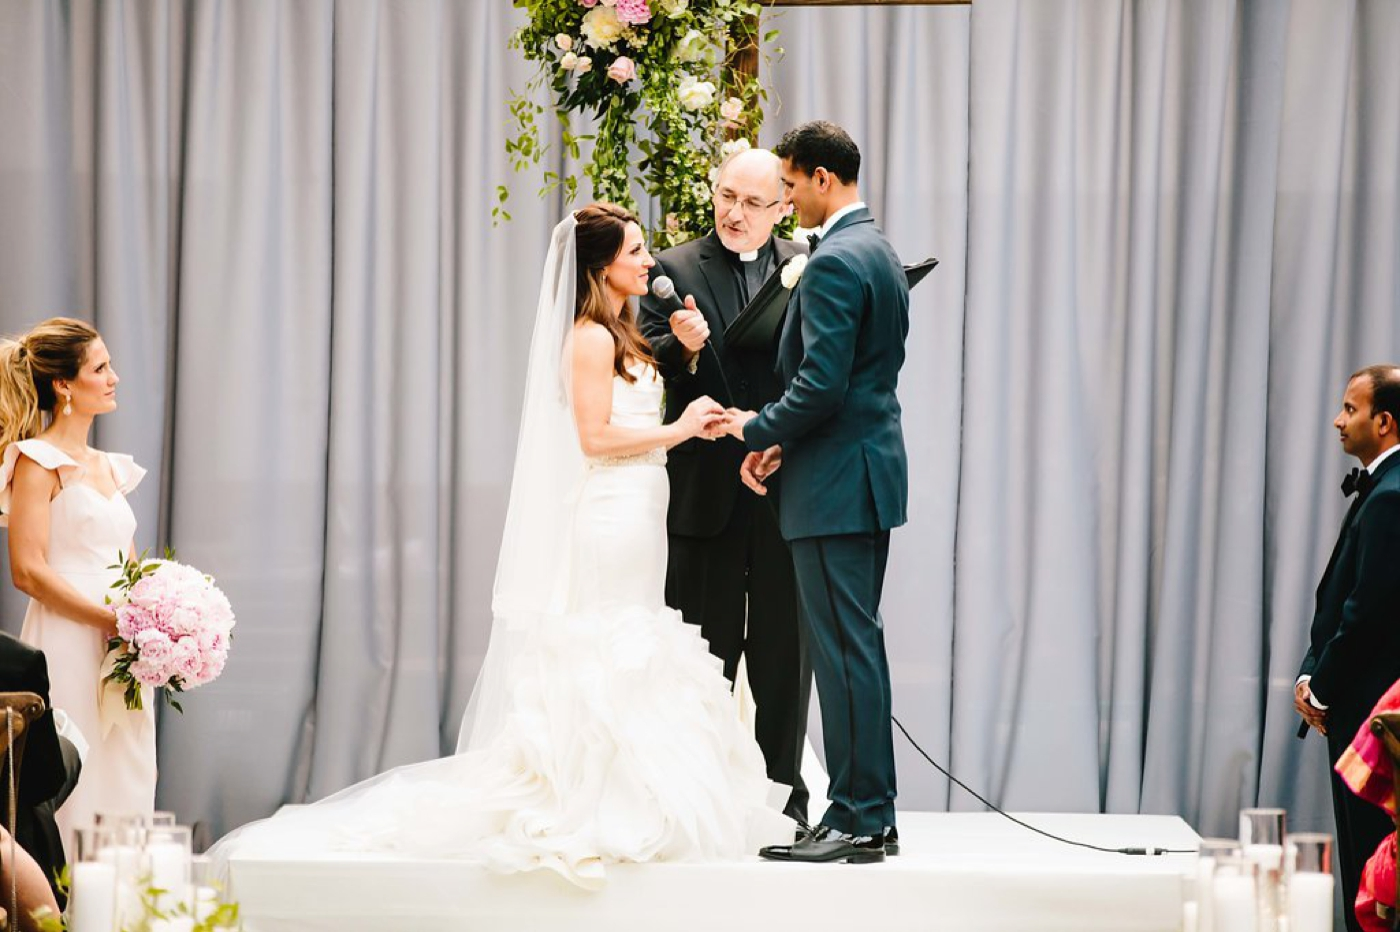 chicago-fine-art-wedding-photography-sakamuri58